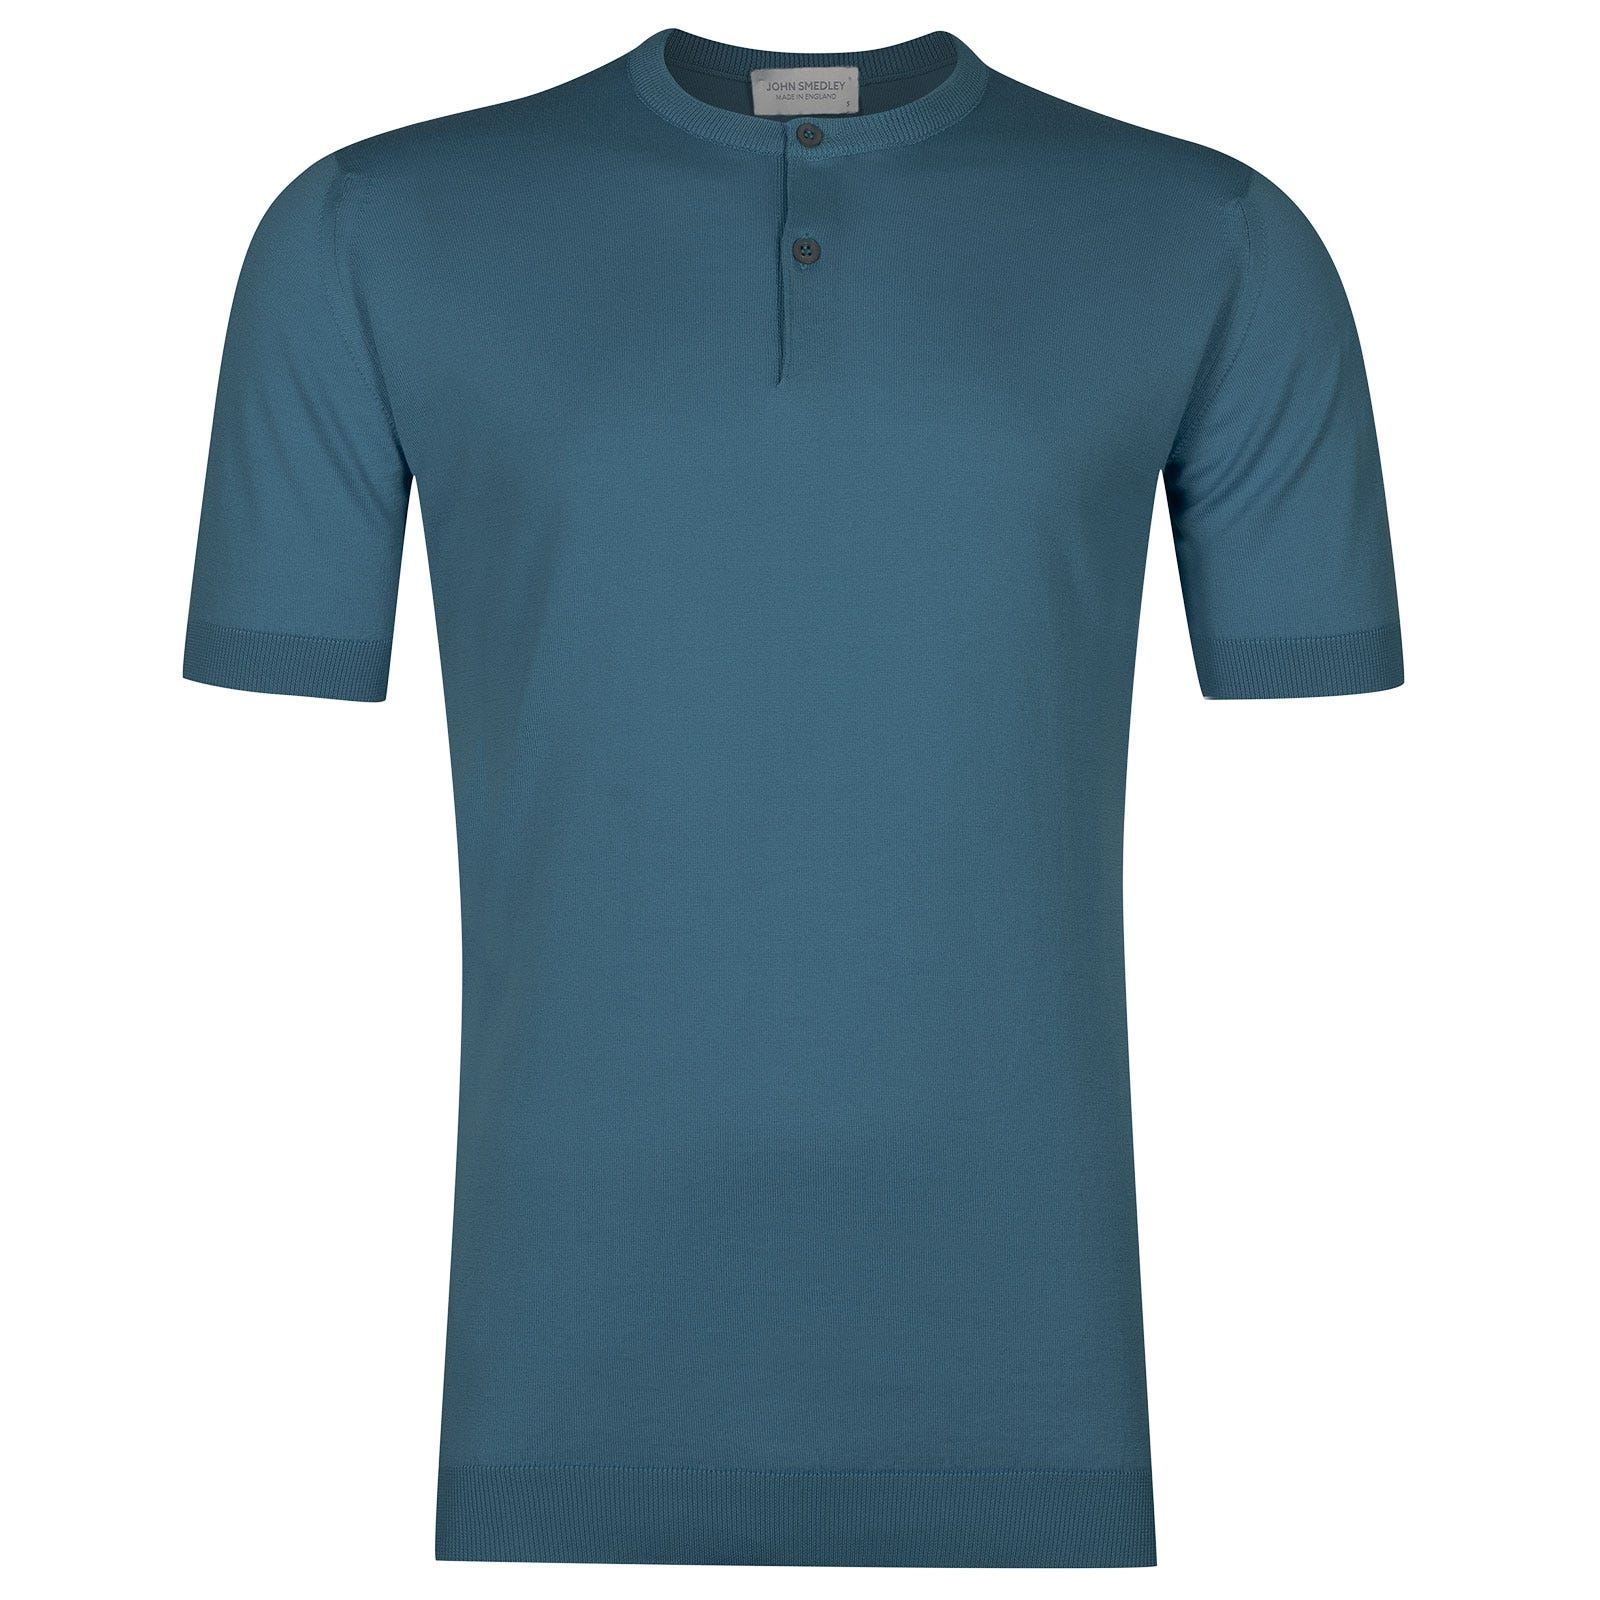 John Smedley Bennett Sea Island Cotton T-shirt in Bias Blue-L